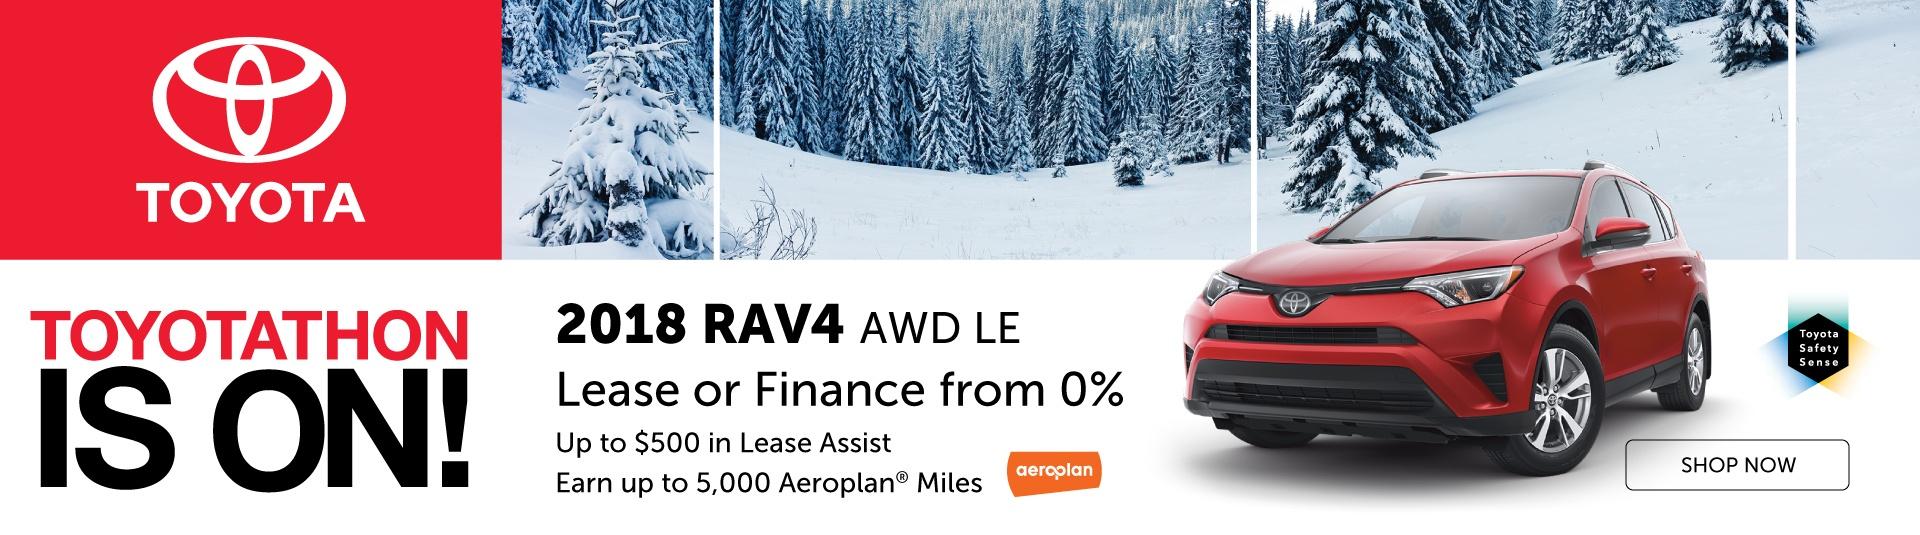 2018 Toyota RAV4 Offers in Georgetown